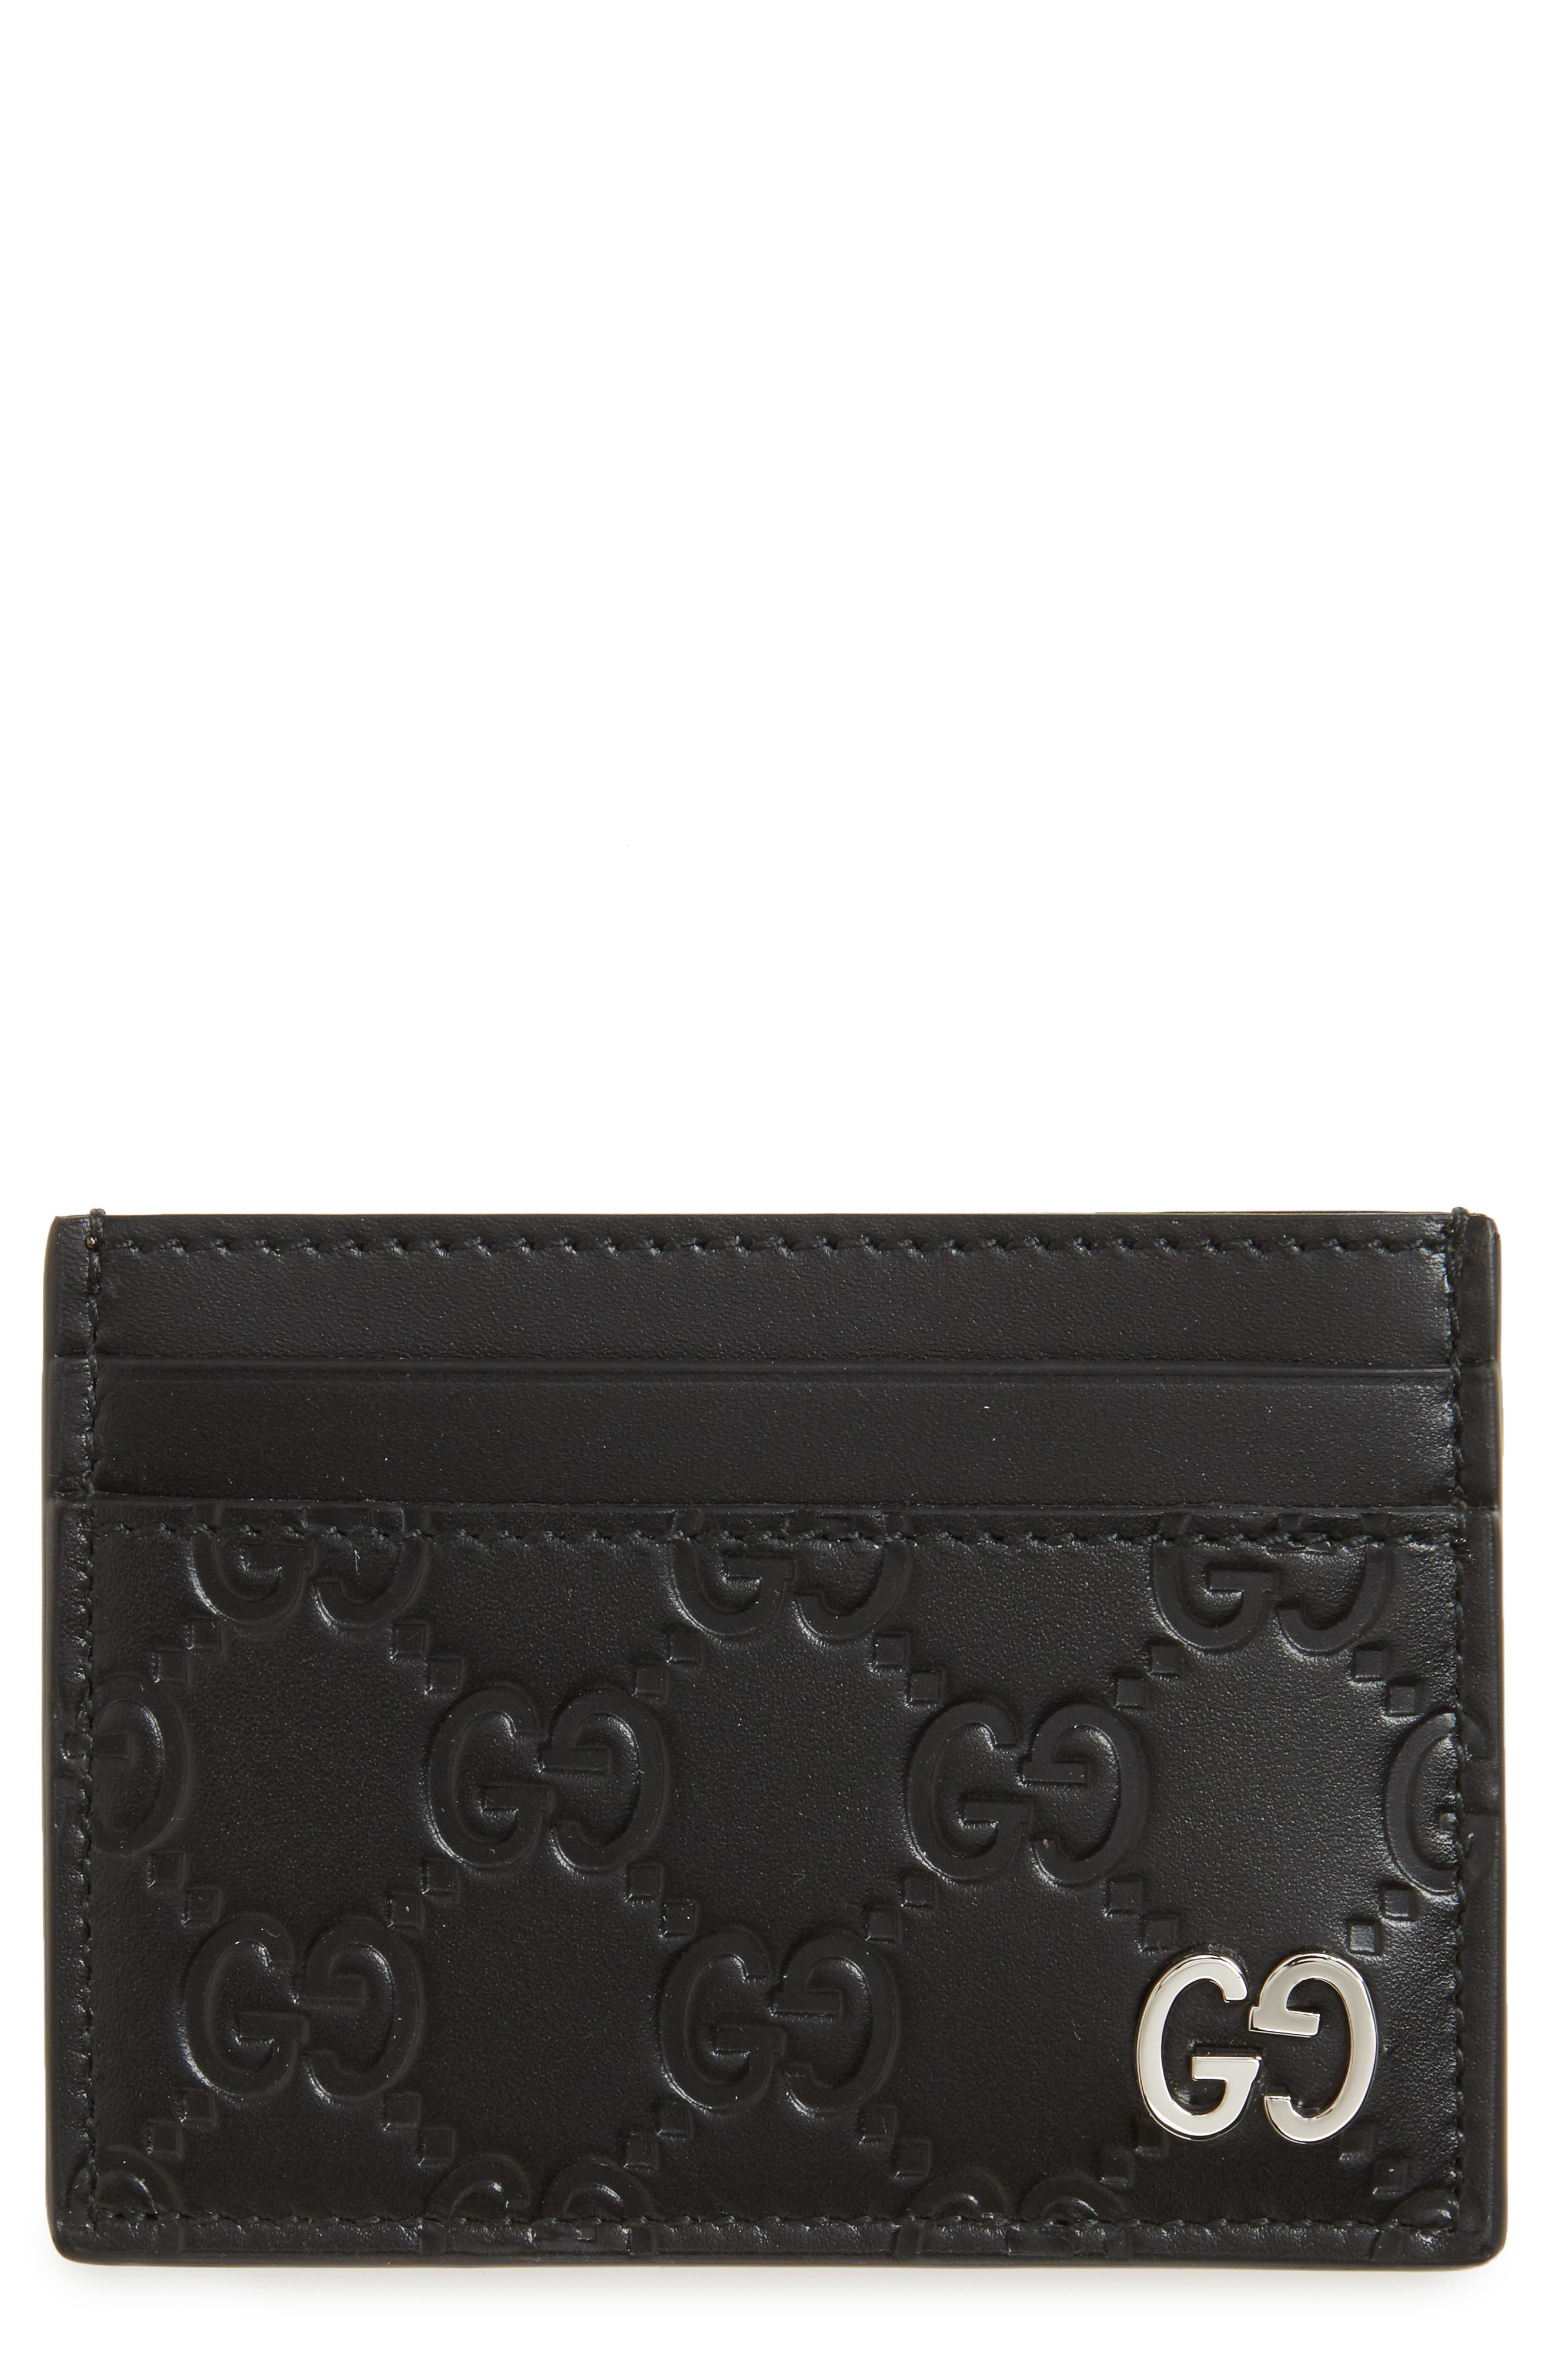 Gucci Dorian Leather Card Case